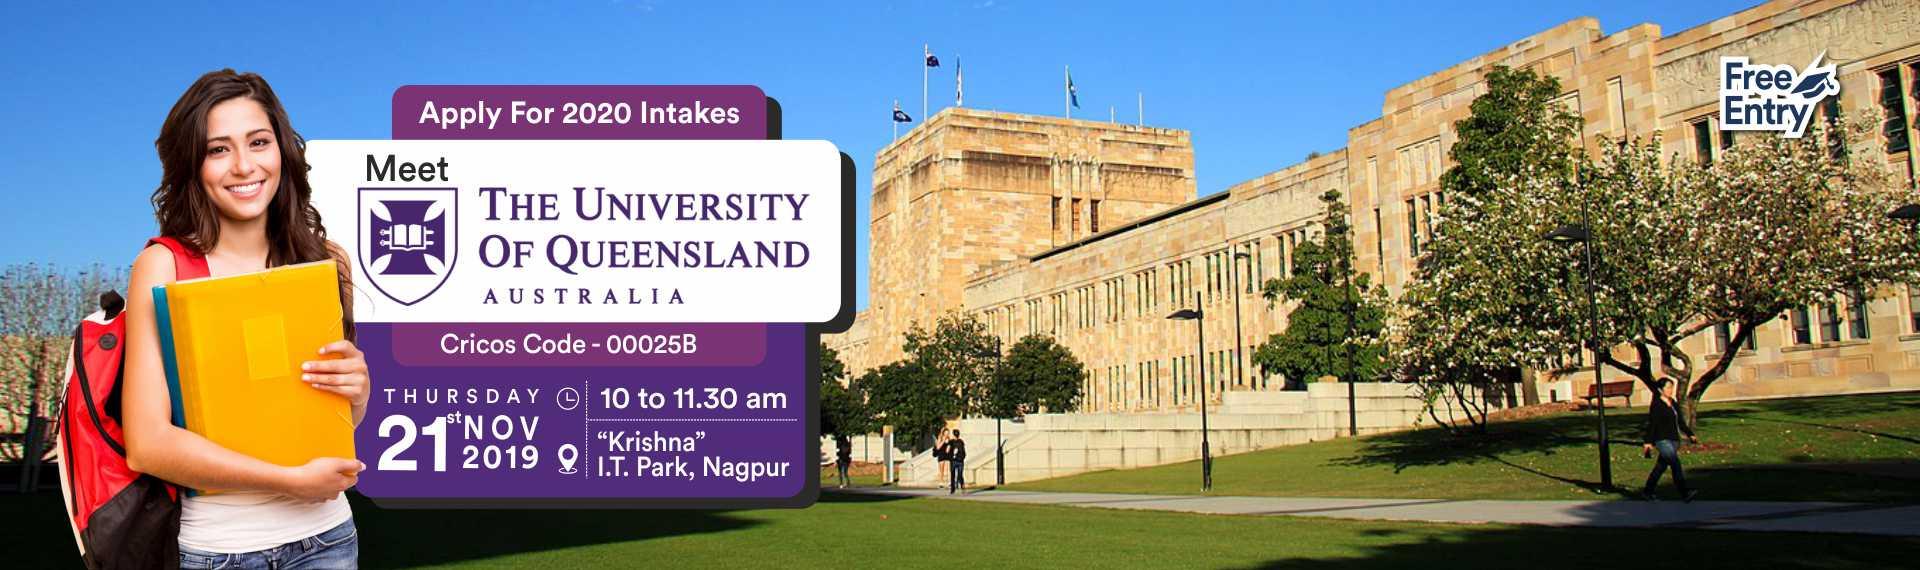 Meet & Apply to The University of Queensland, Australia - 21st Nov 19